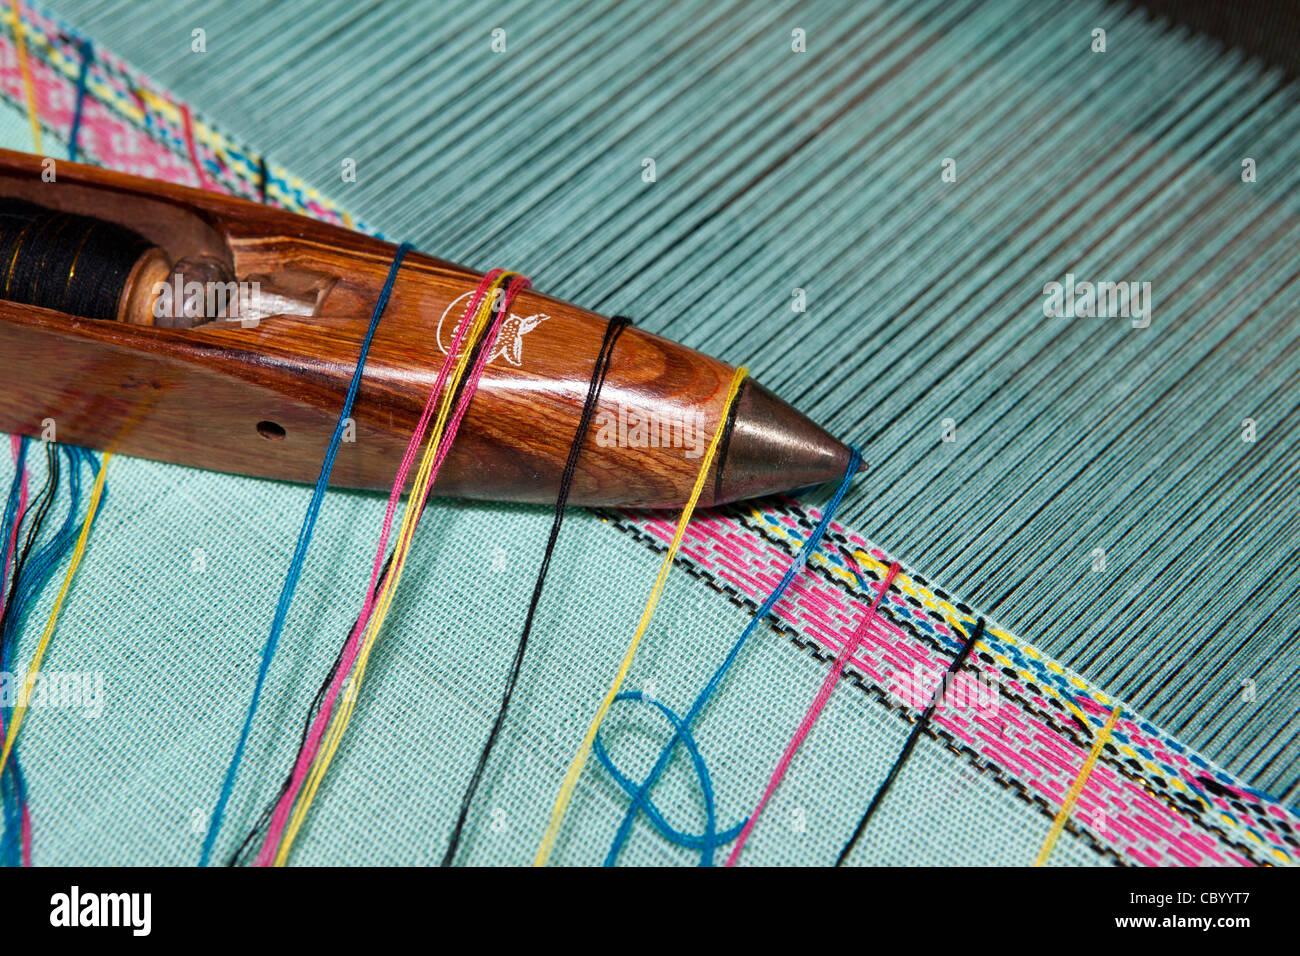 India, Arunachal Pradesh, Along, Paya village, handloom weaving, shuttle and threads on top of cloth being woven - Stock Image